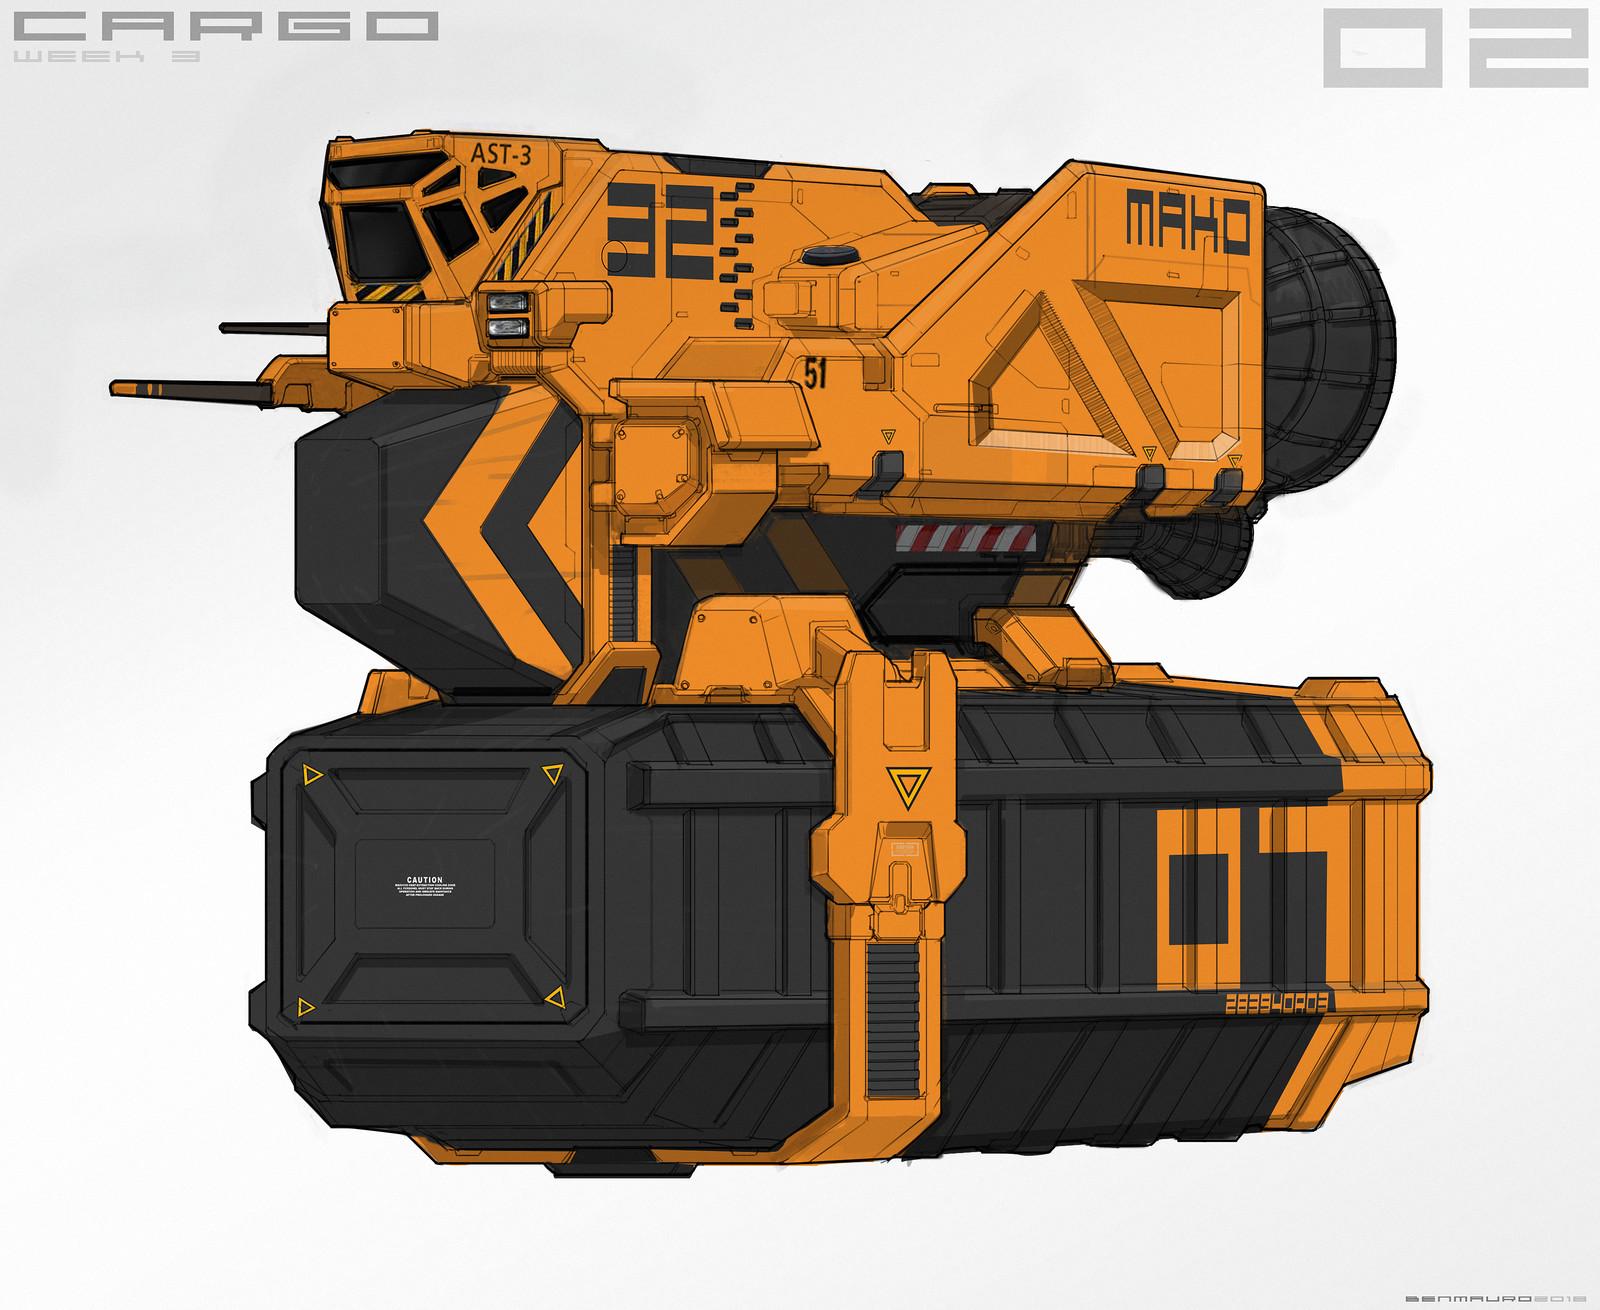 Cargo Spaceship Sketches + Studies